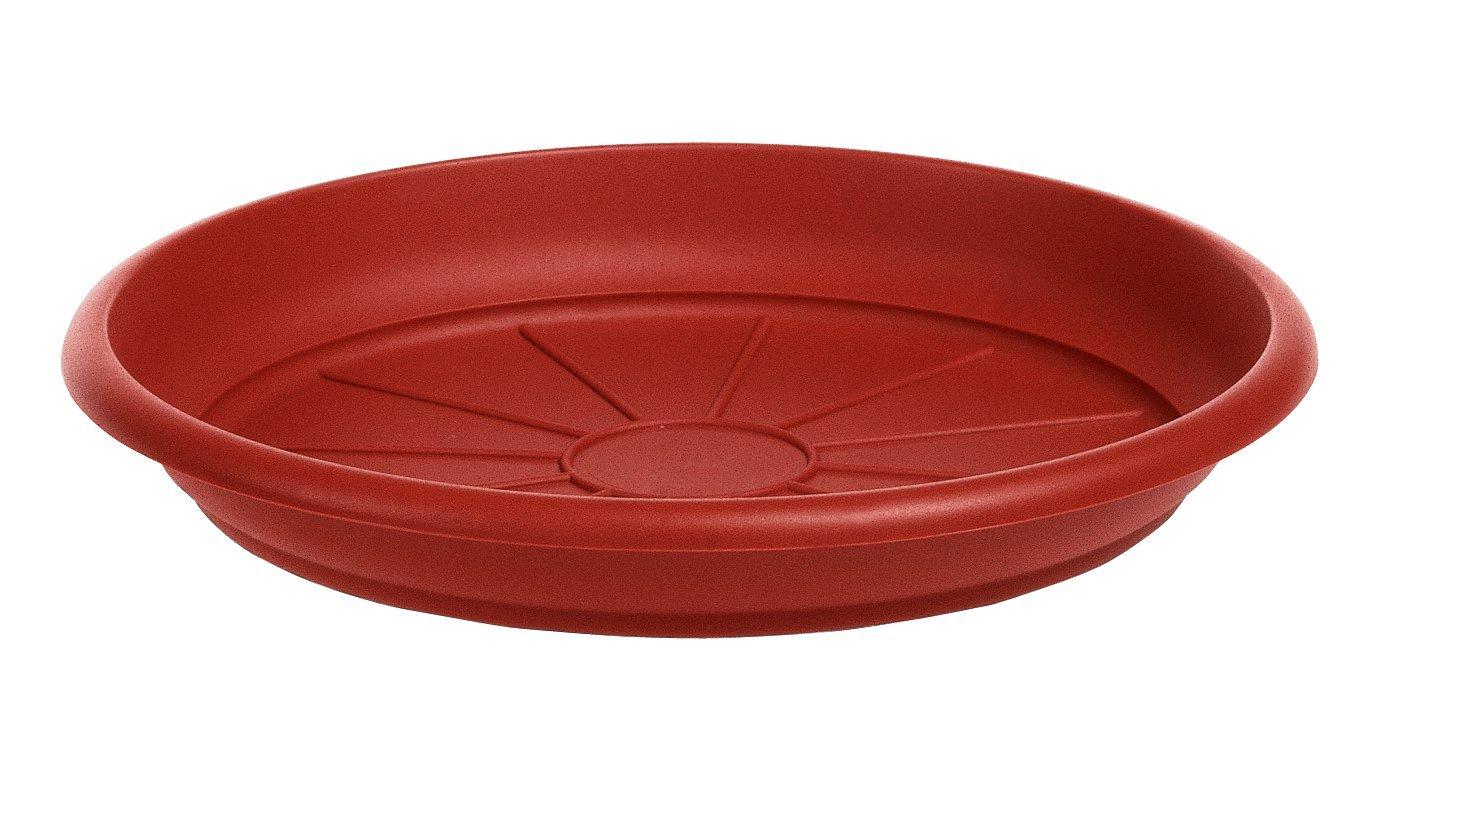 Tildenet 83260 26cm Terra Mediterraneo Saucer Tildenet Gardenware